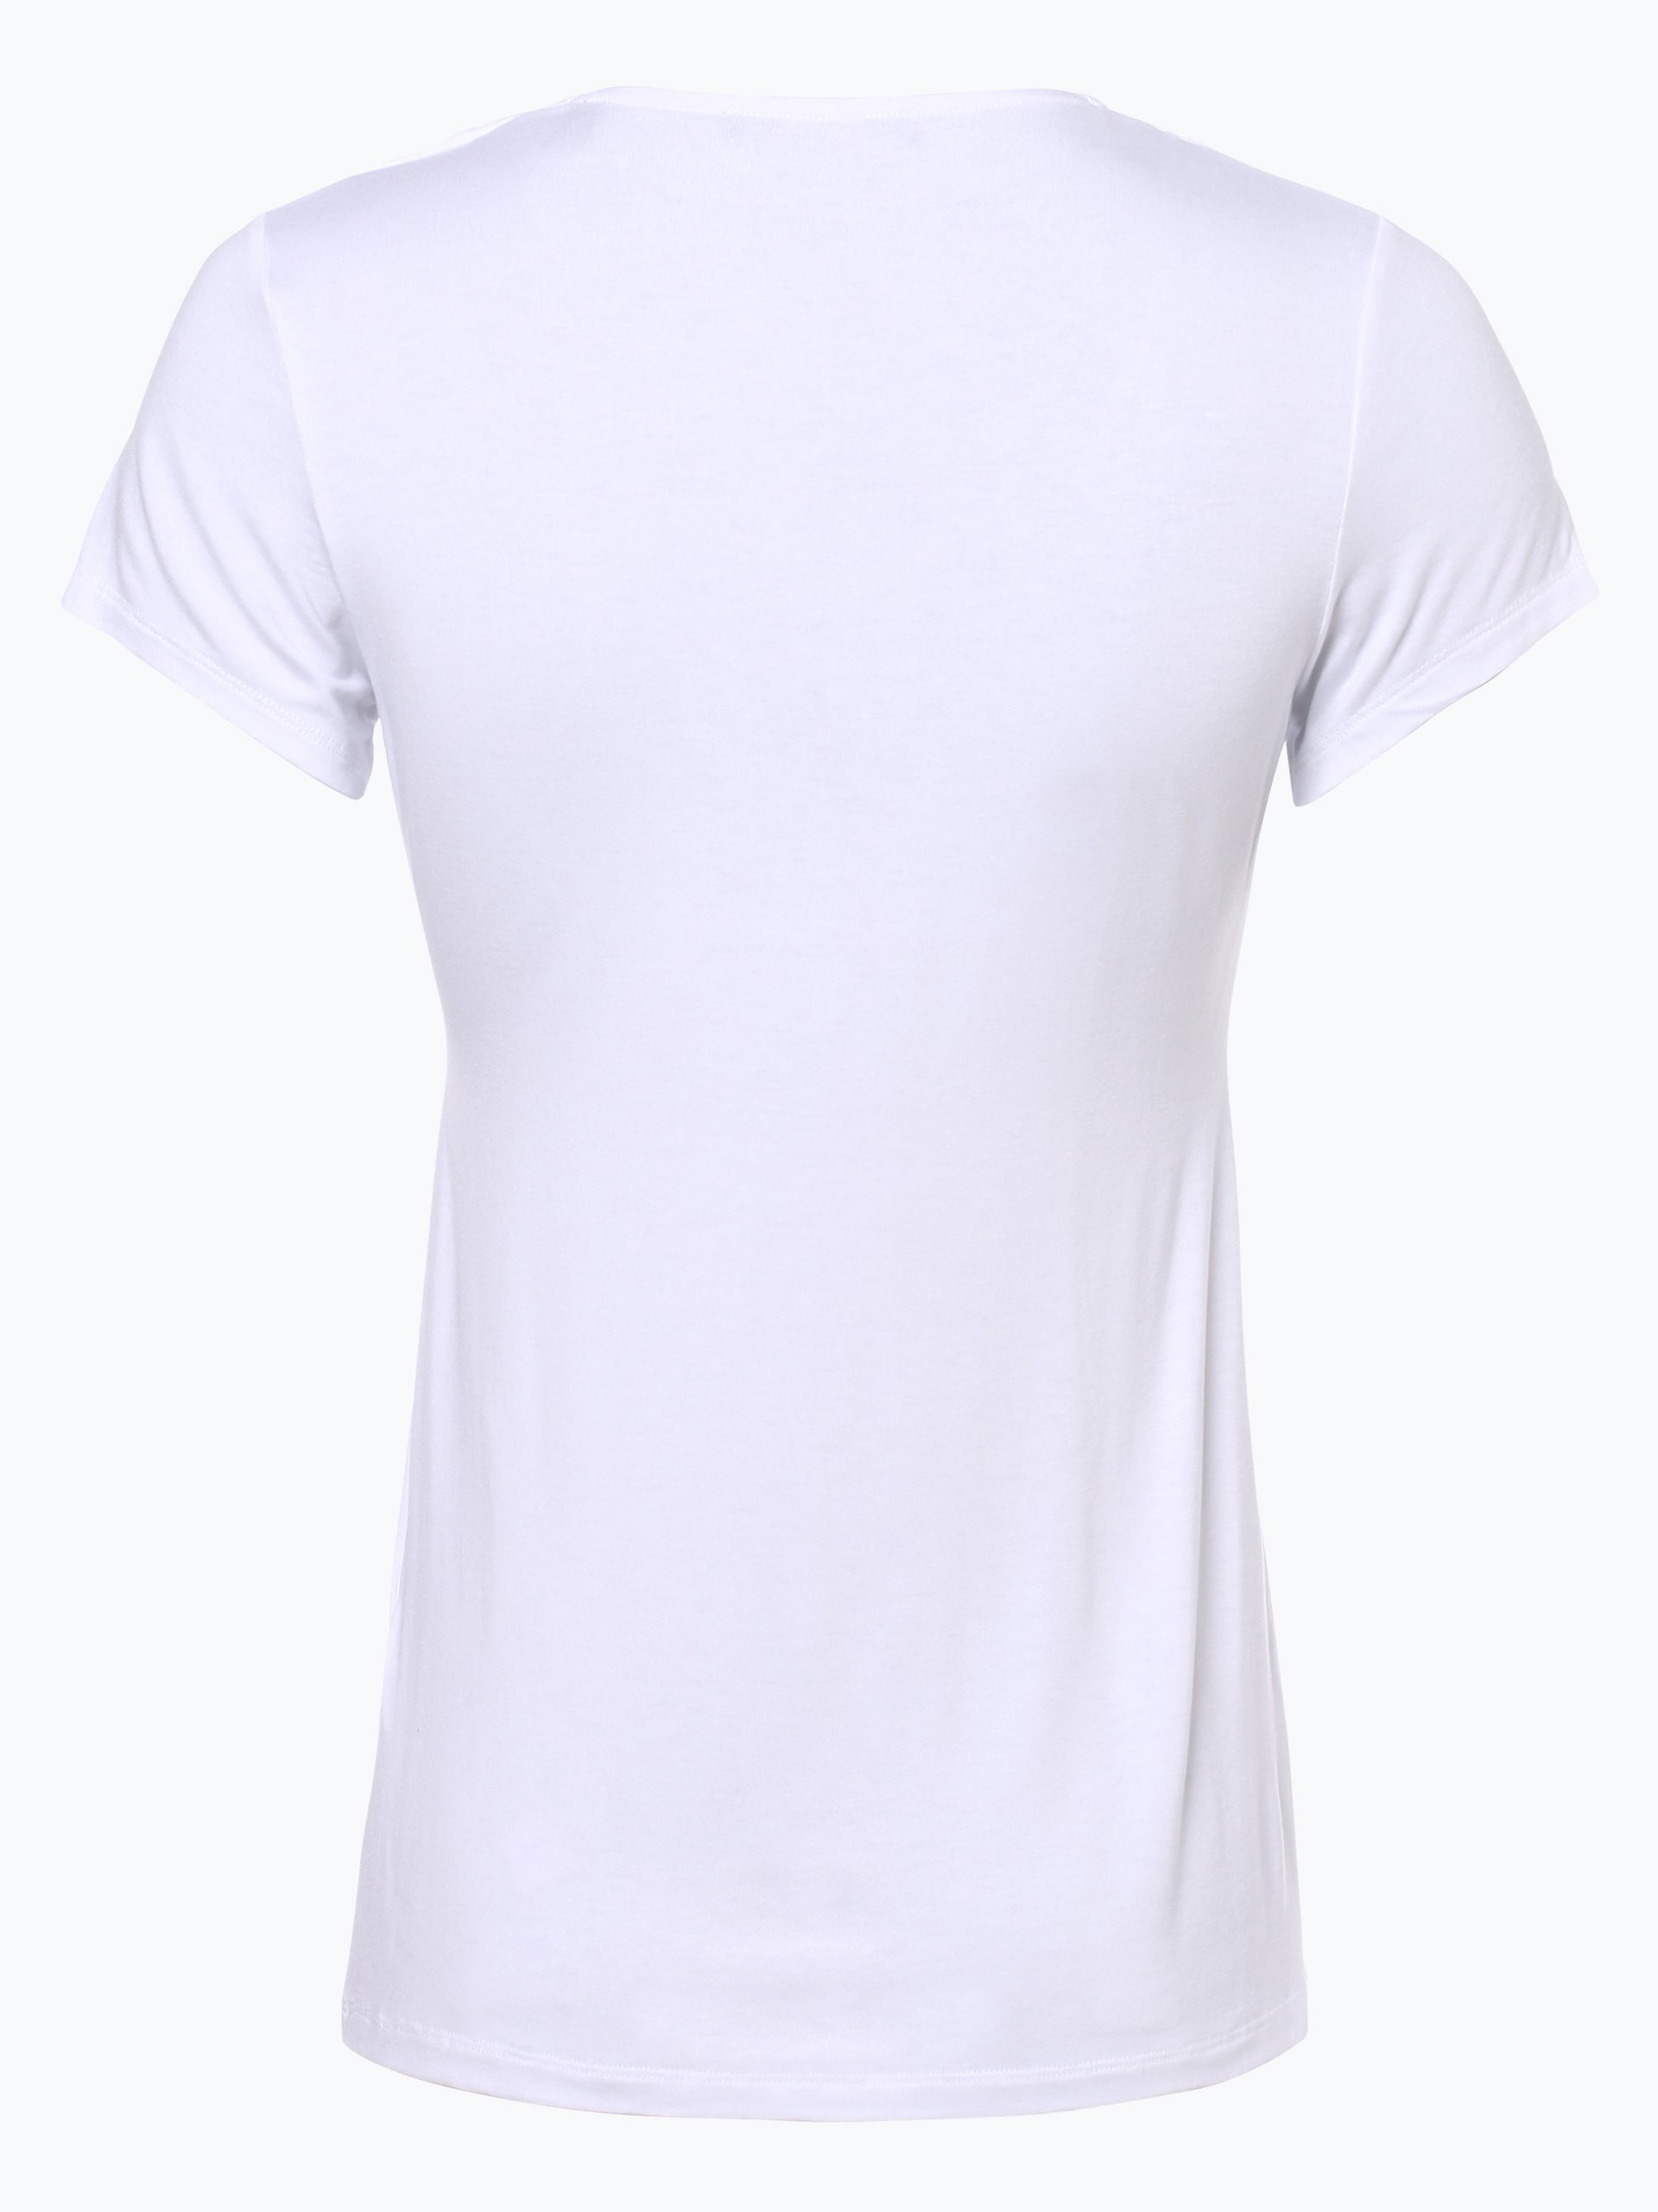 esprit collection damen t shirt wei uni online kaufen. Black Bedroom Furniture Sets. Home Design Ideas